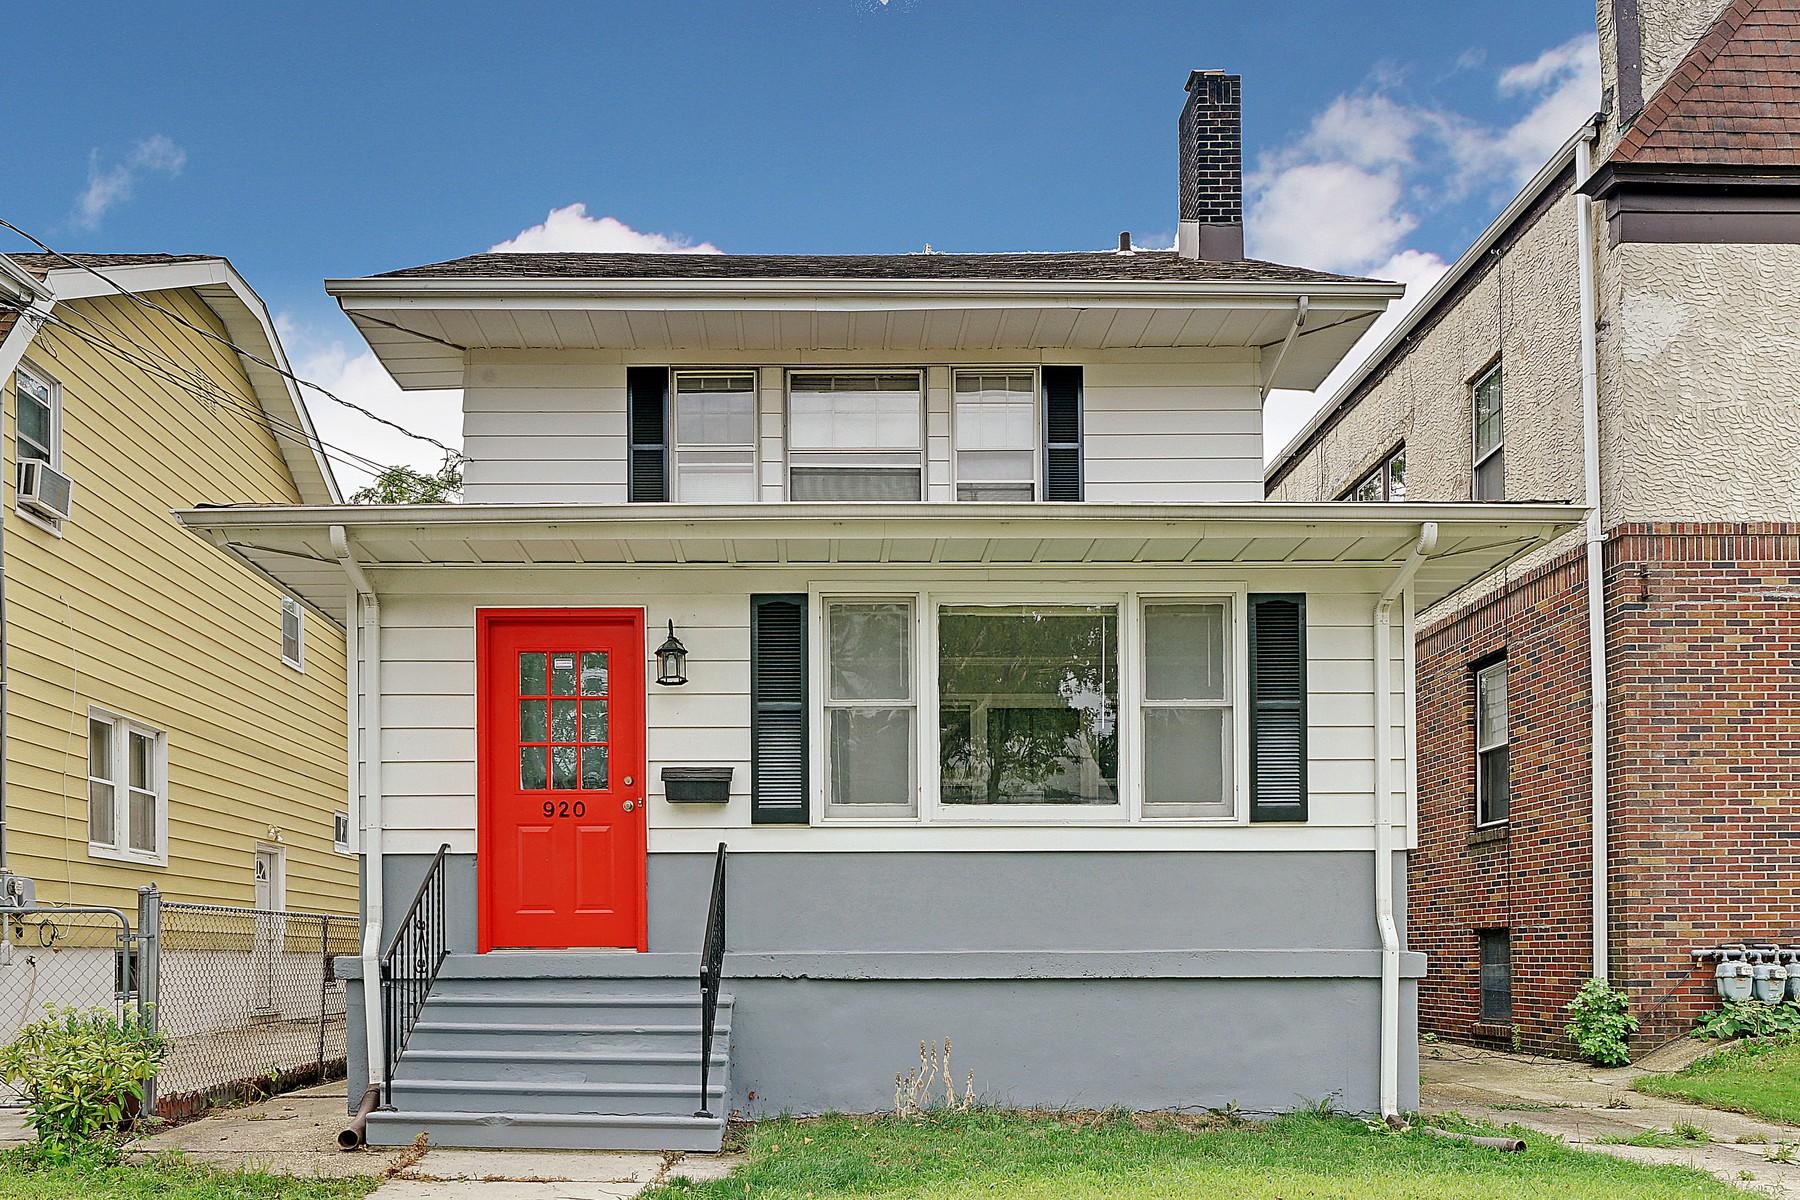 واحد منزل الأسرة للـ Sale في Inviting Shore Colonial 920 4th Ave Asbury Park, New Jersey 07712 United States